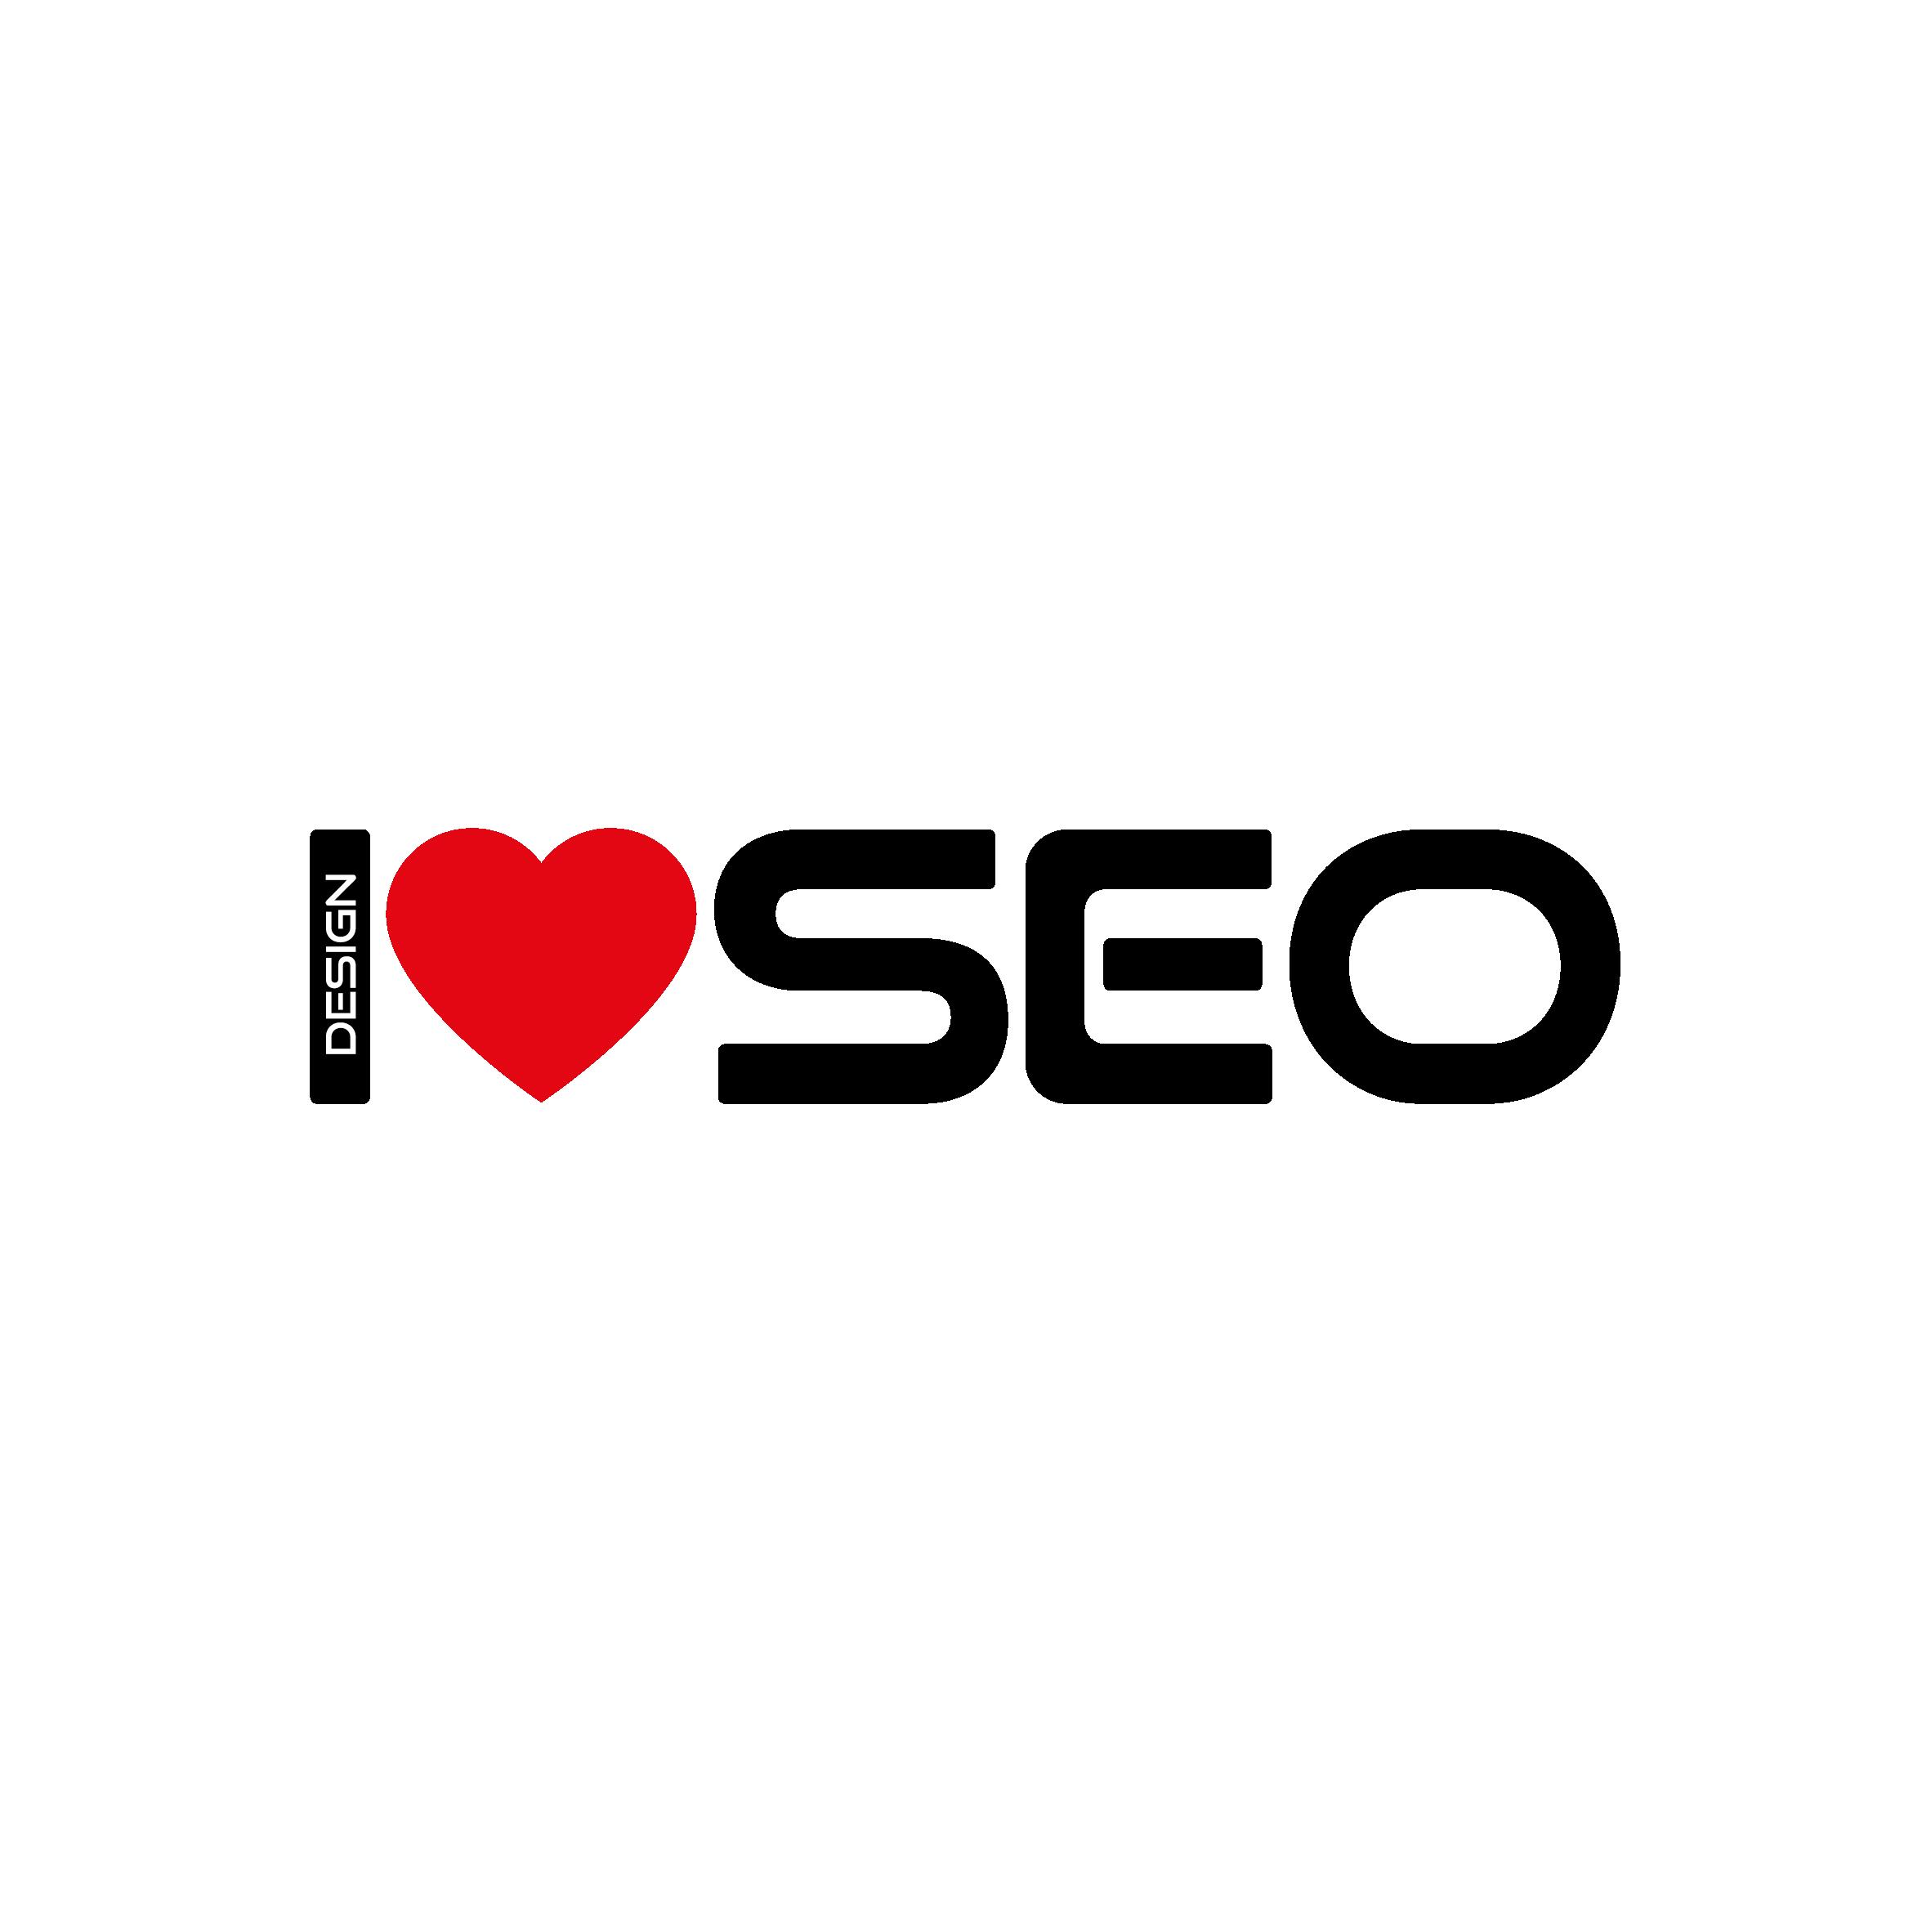 DesignSEO logo